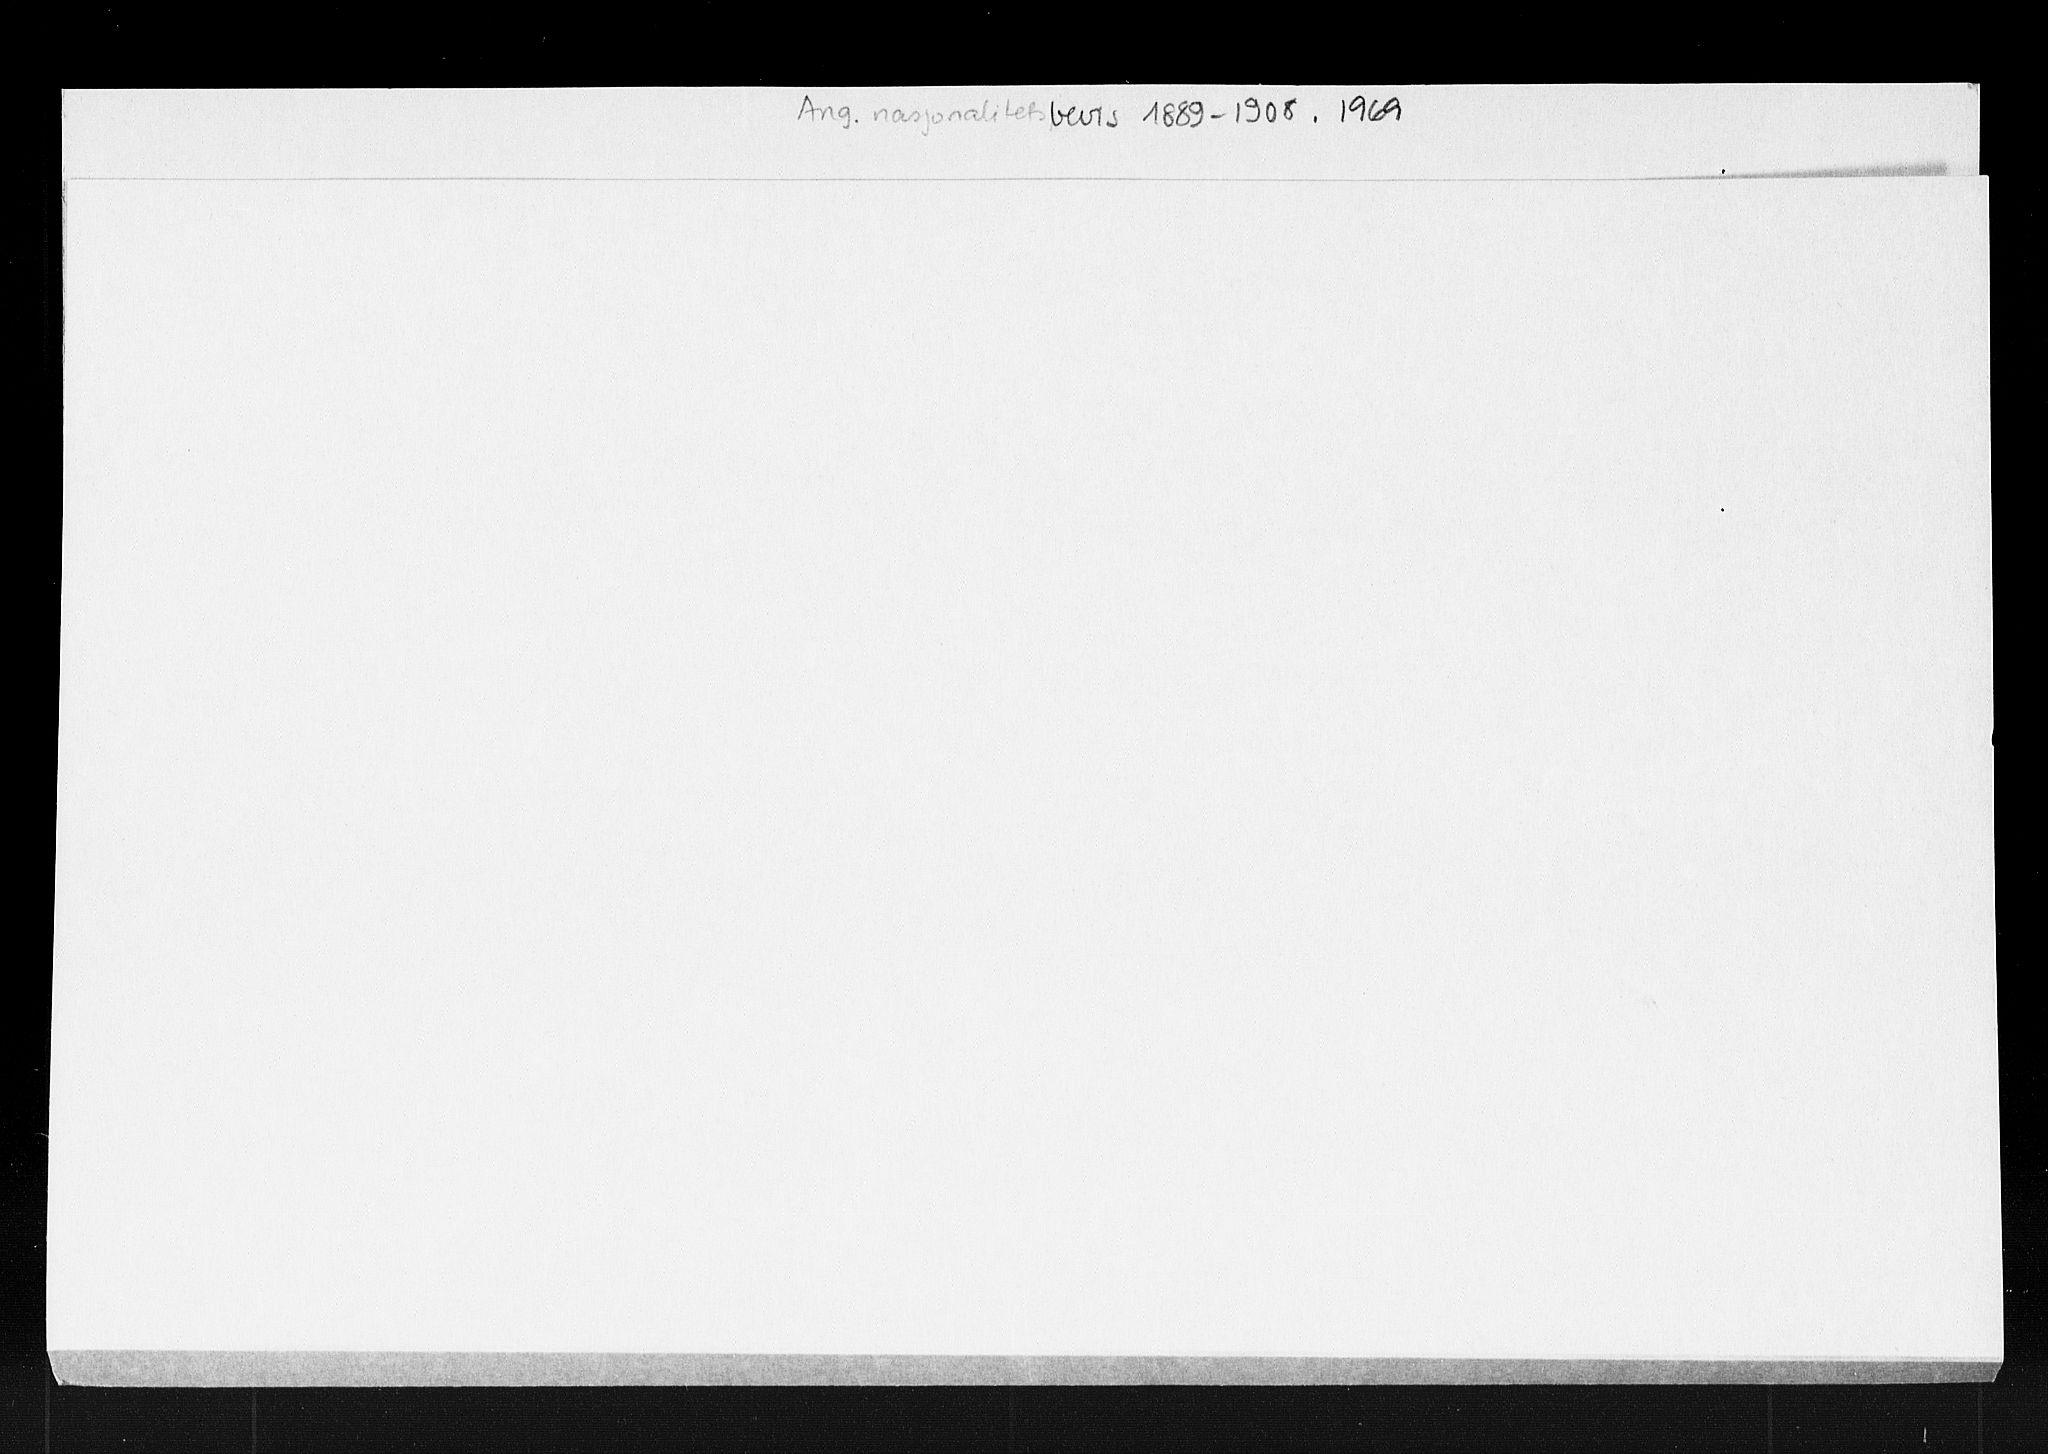 SAK, Lillesand tollsted, H/Ha/L0433: Skipsregister, skipsmatrikkel, 1861-1969, s. 355